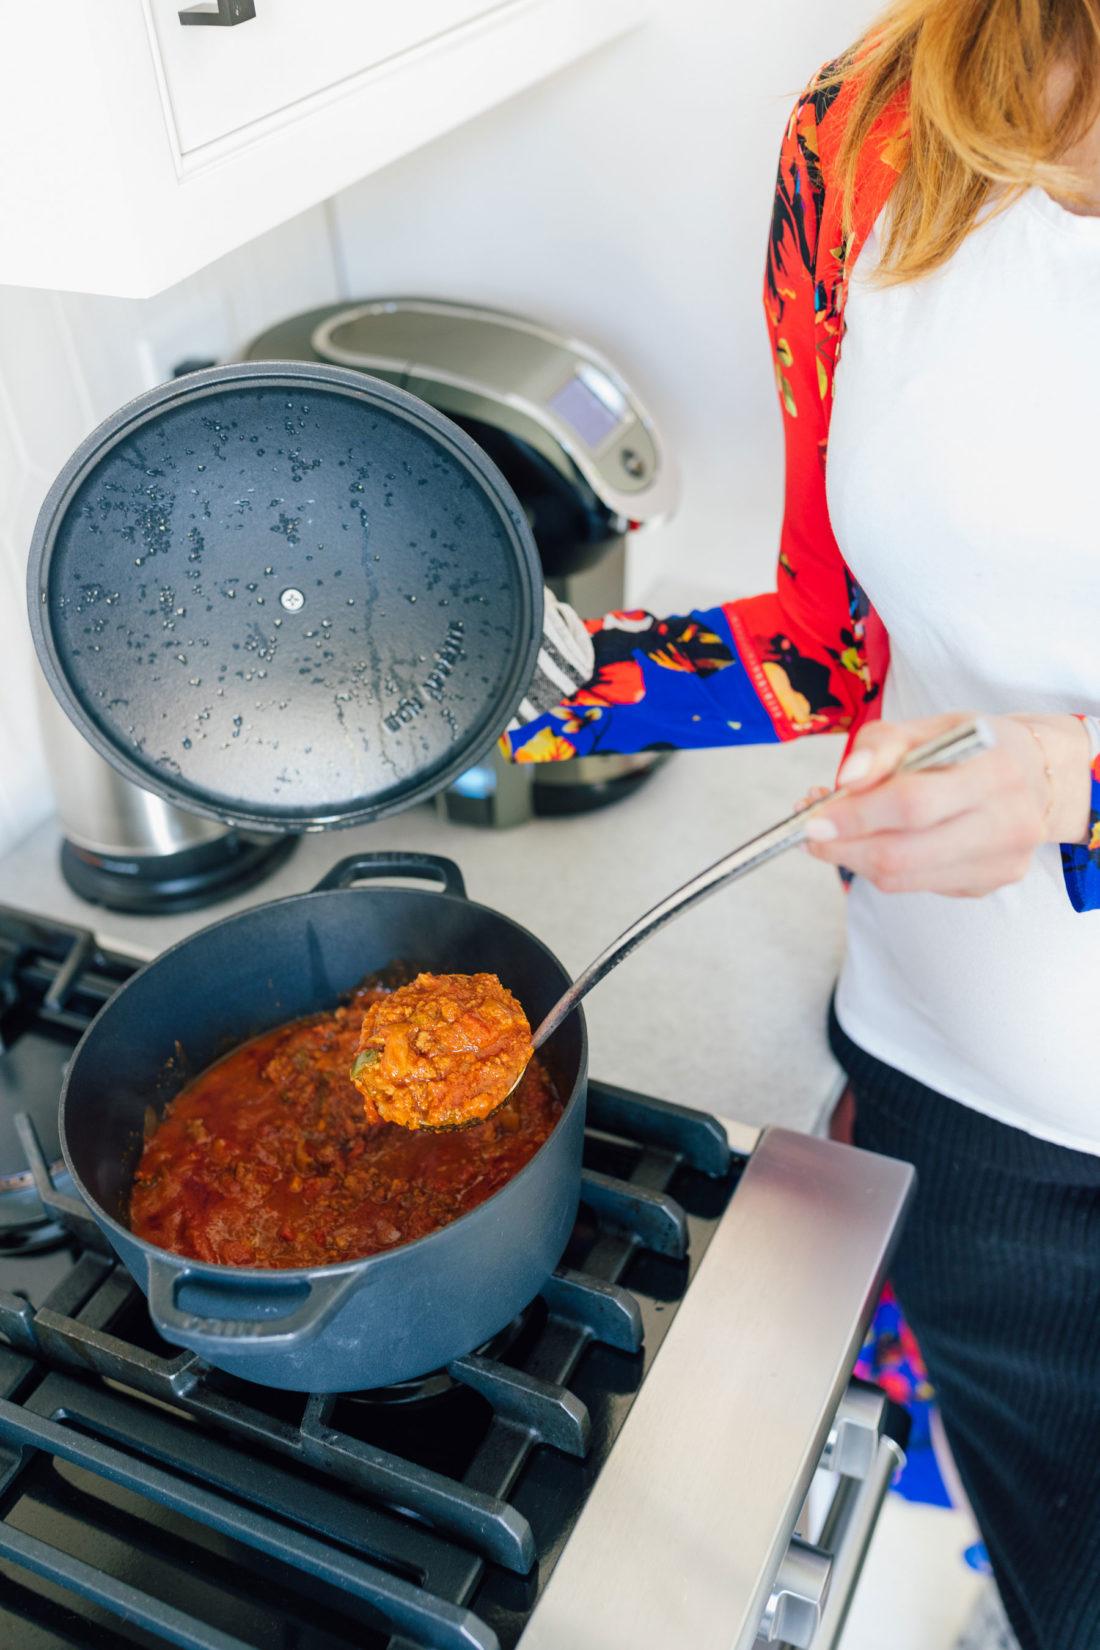 Blogger Eva Amurri shares her go-to chili recipe